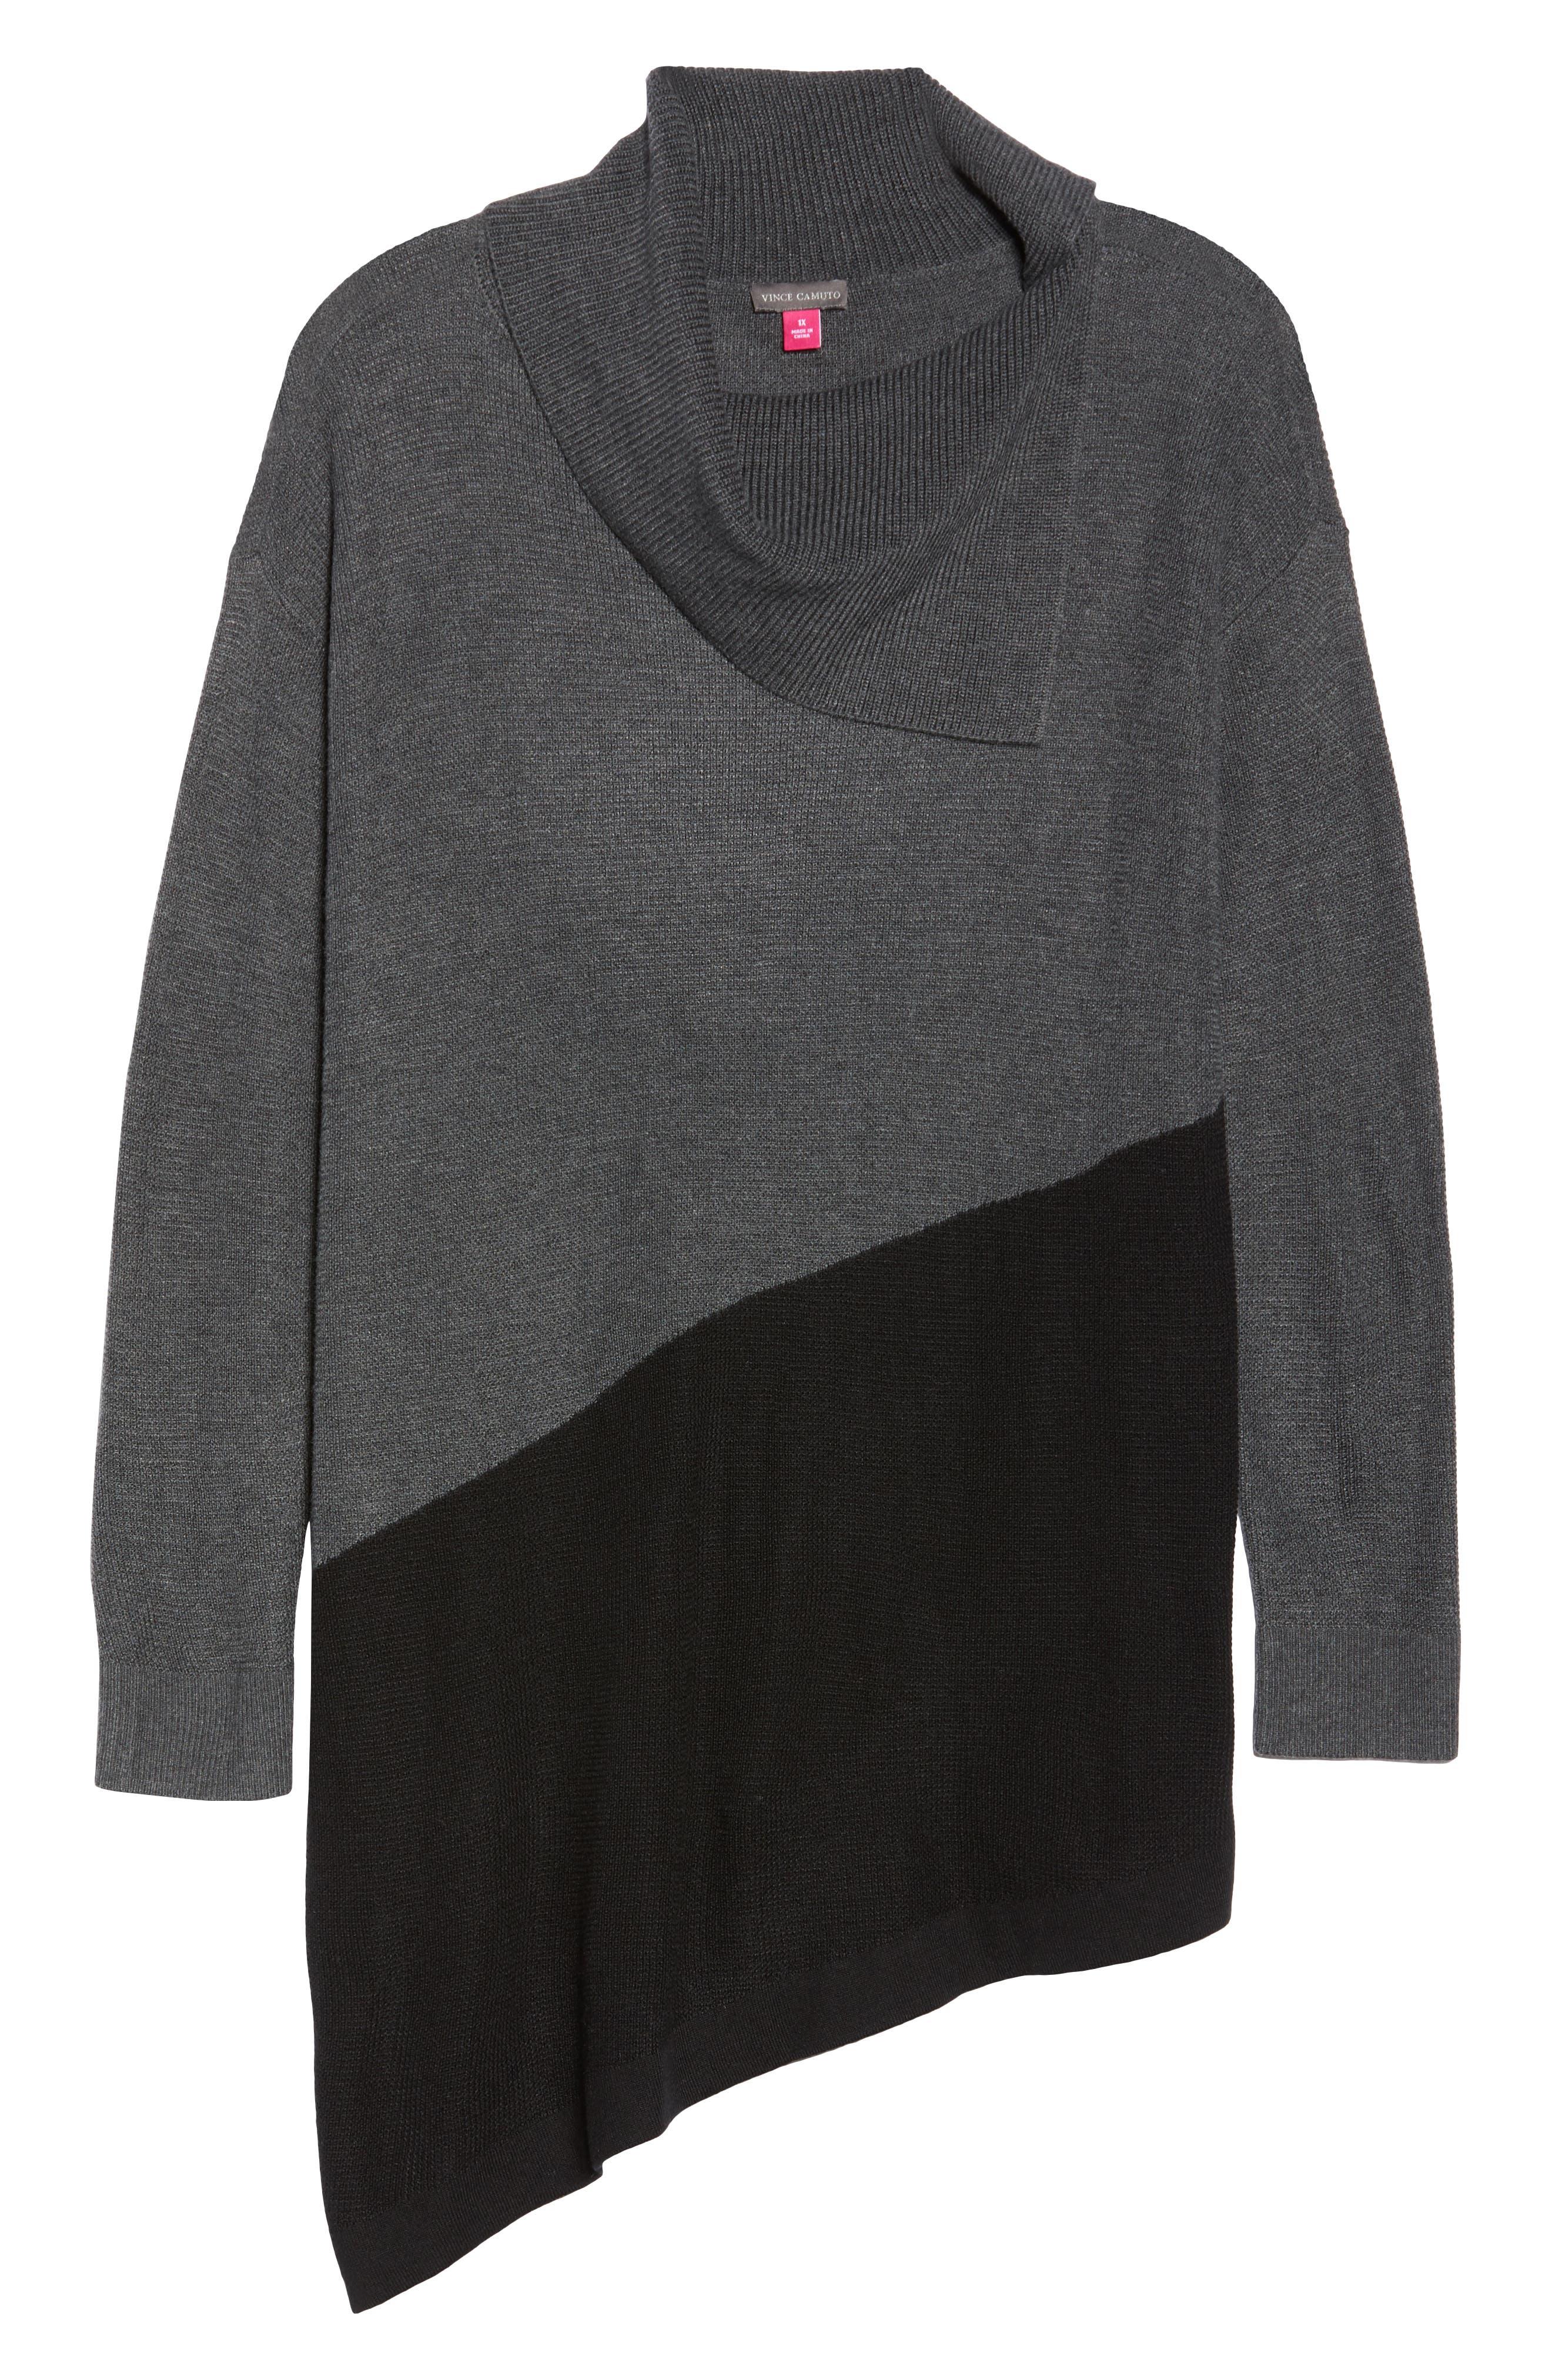 Asymmetrical Colorblock Sweater,                             Alternate thumbnail 6, color,                             MEDIUM HEATHER GREY